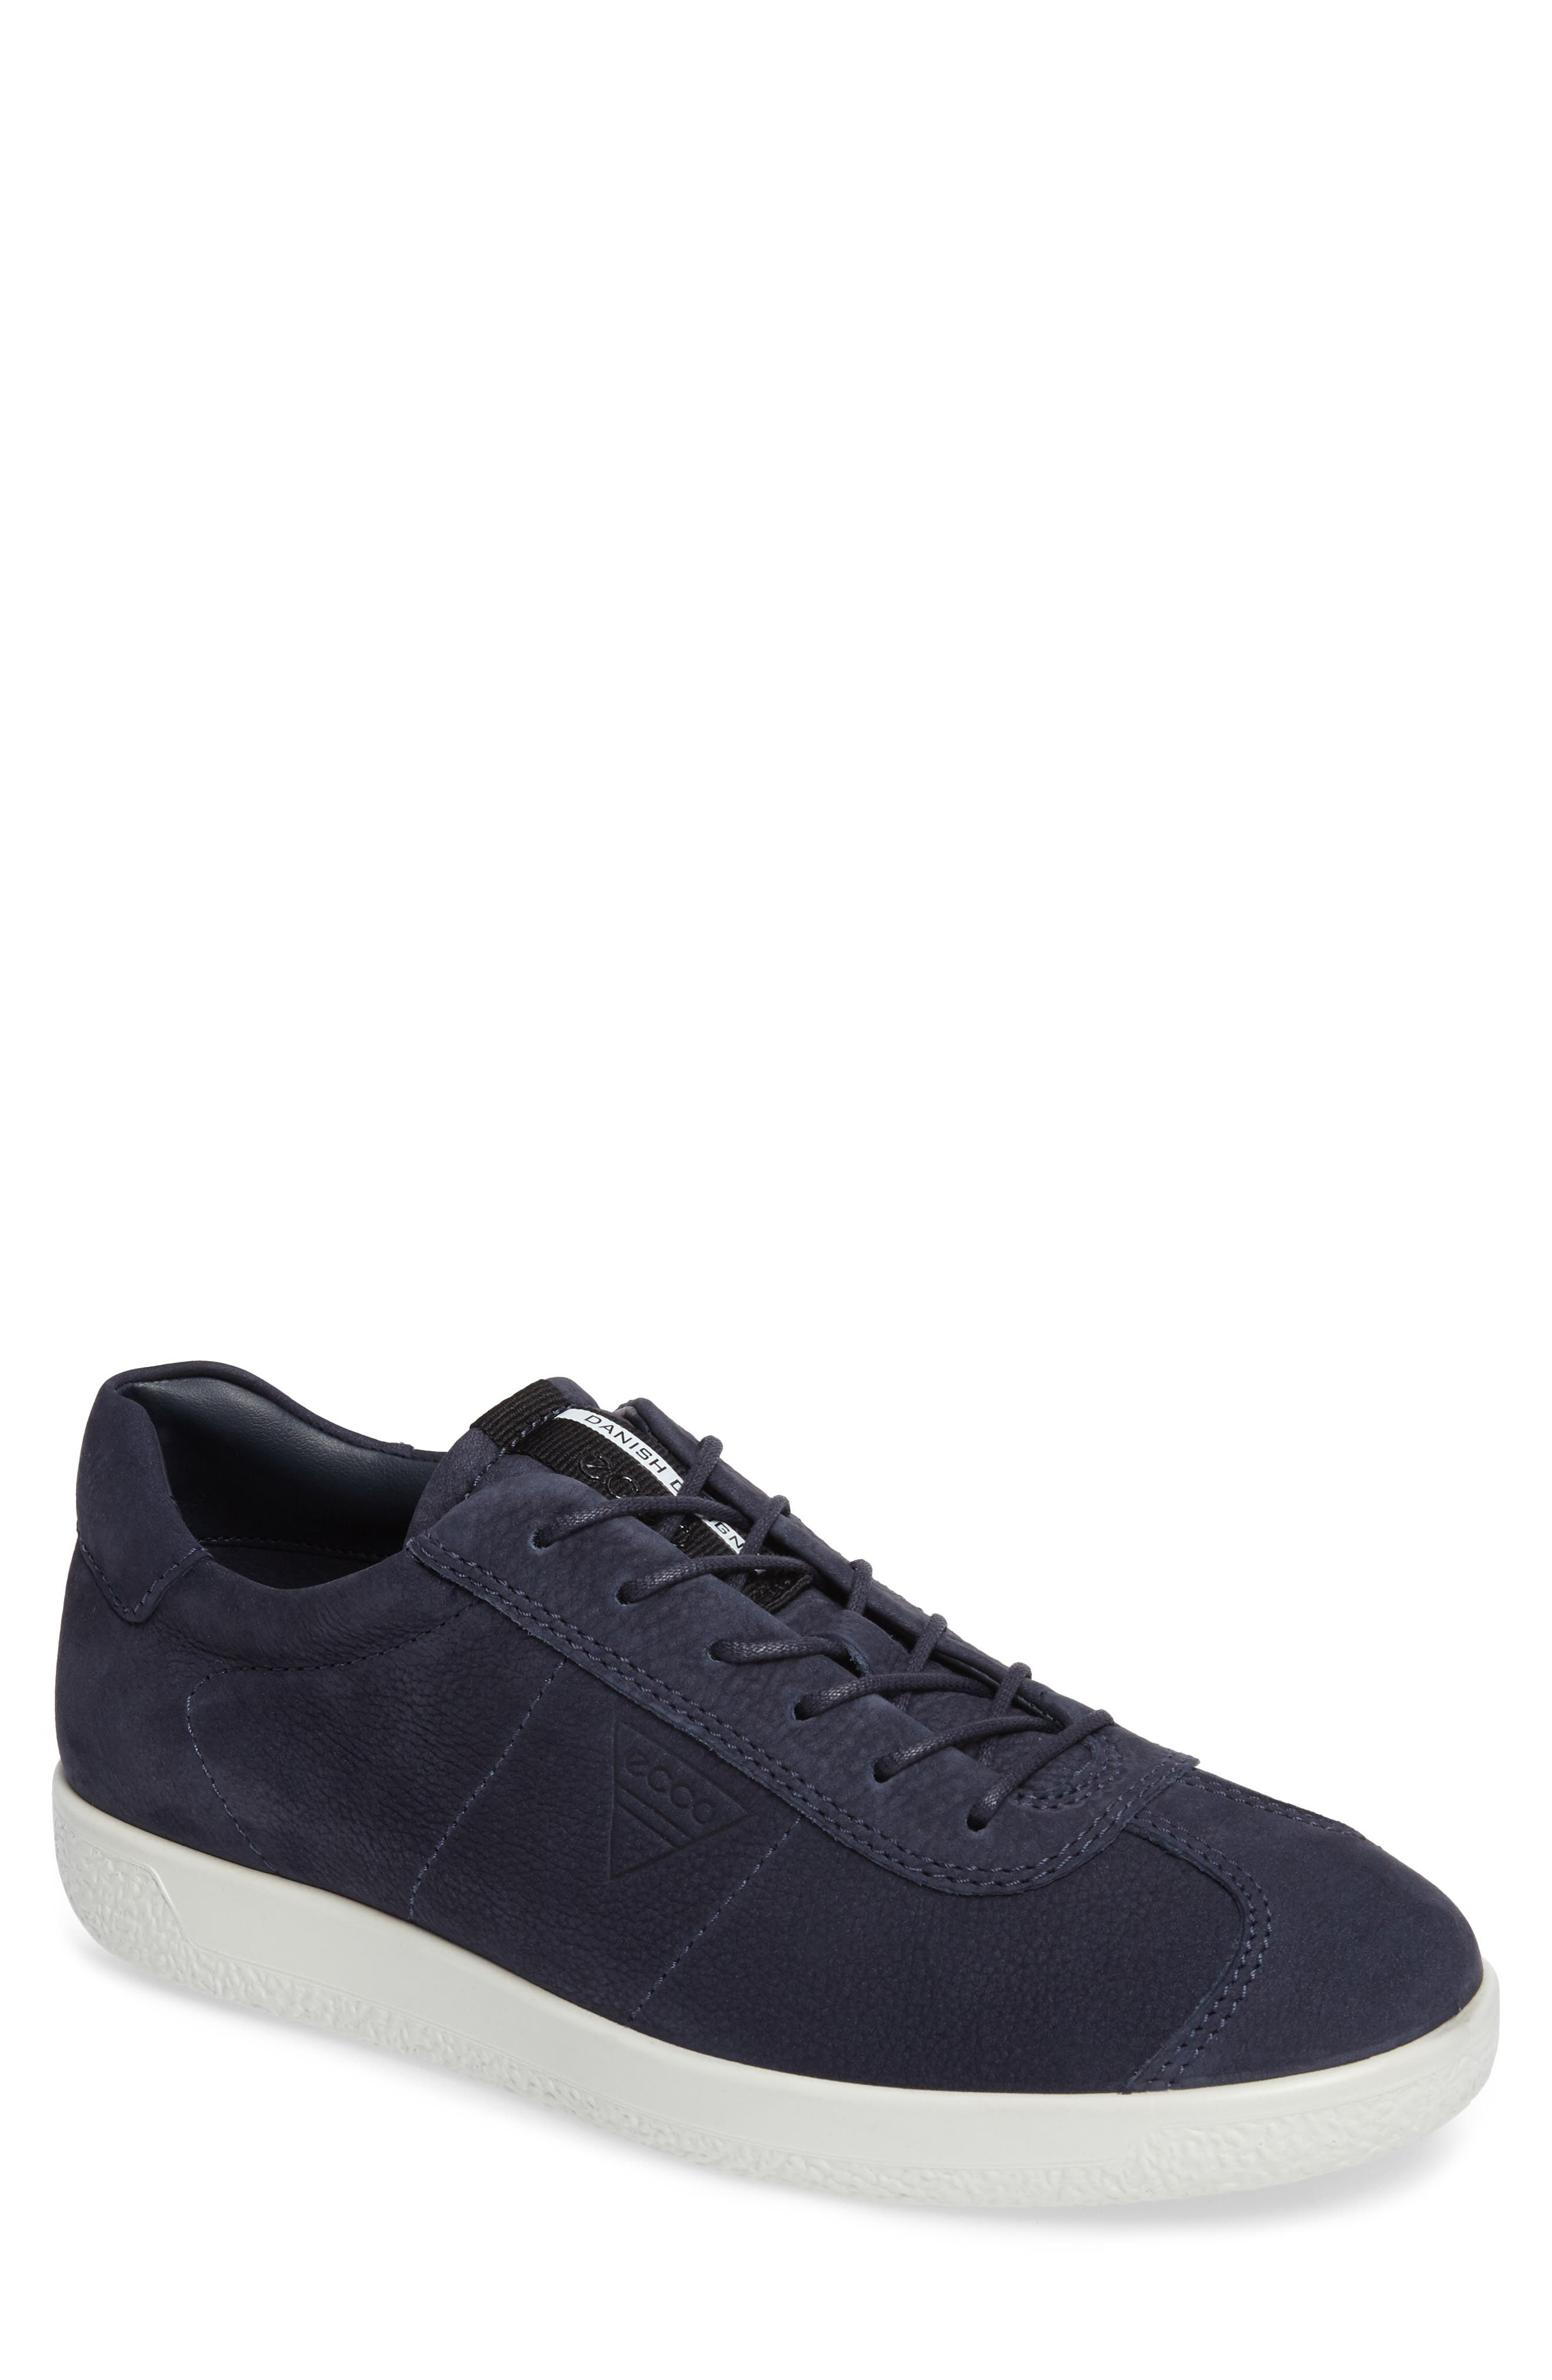 Soft 1 Sneaker,                             Main thumbnail 5, color,